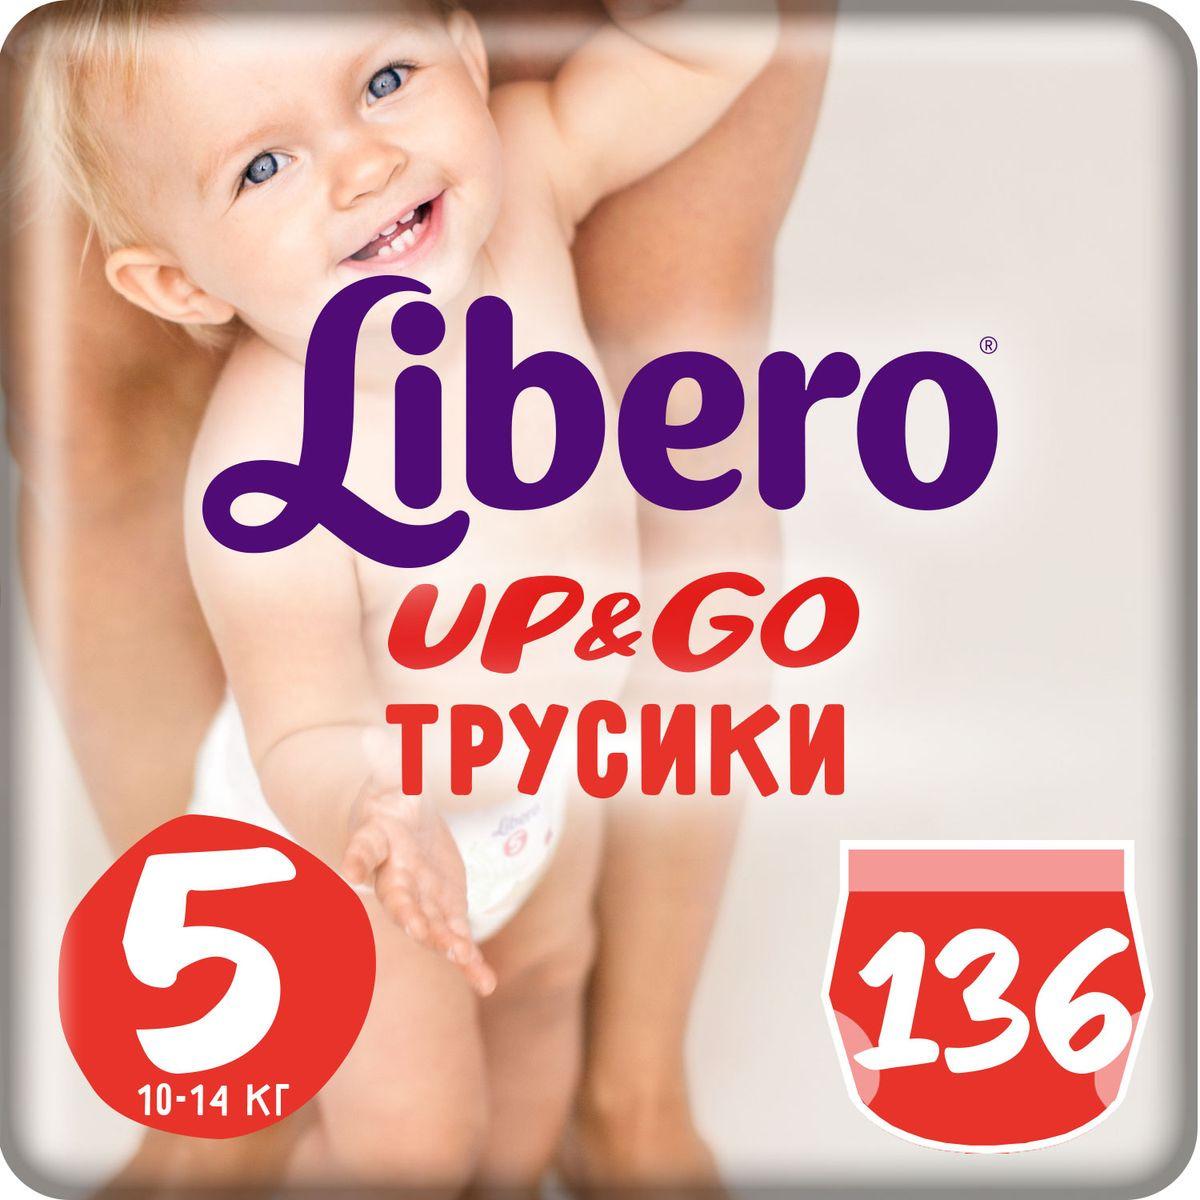 Трусики Libero Up&Go 5, 10-14 кг, 136 шт